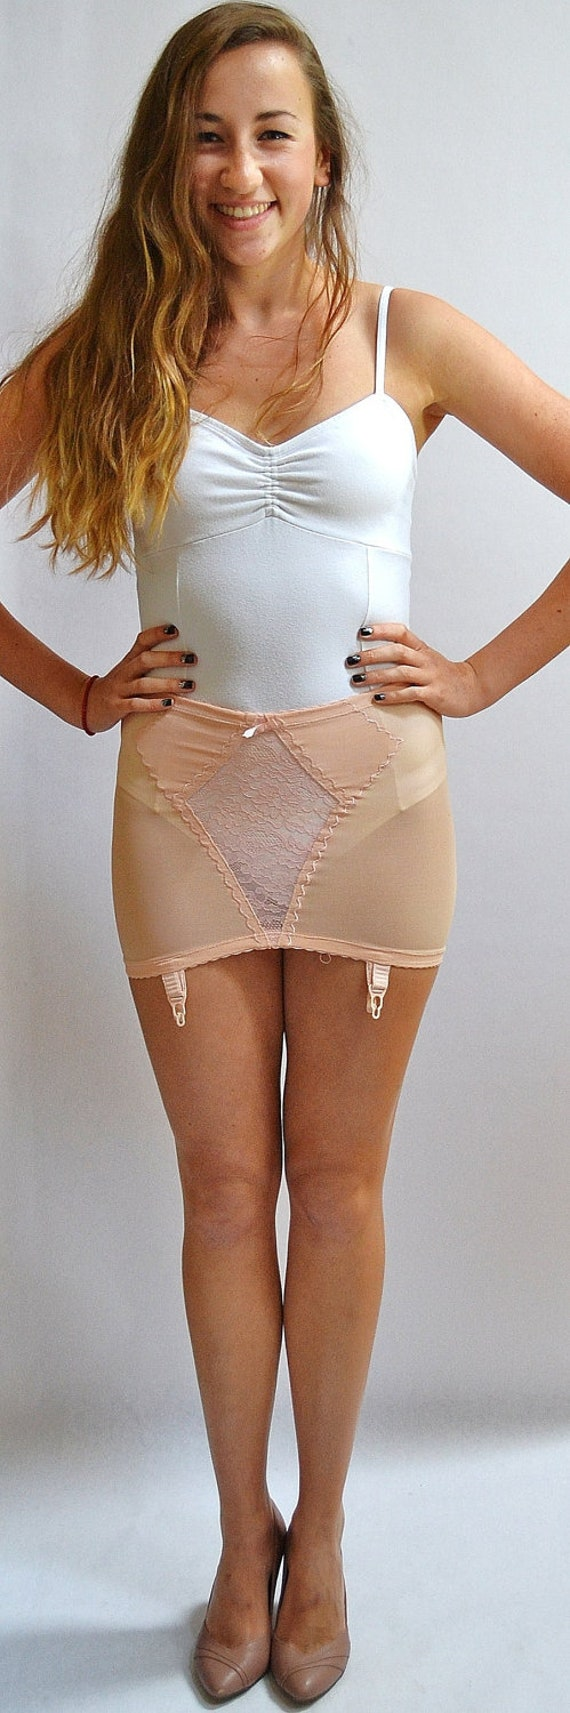 Vintage Blush Colored Lace Panel Girdle Hip Minimizer Garter